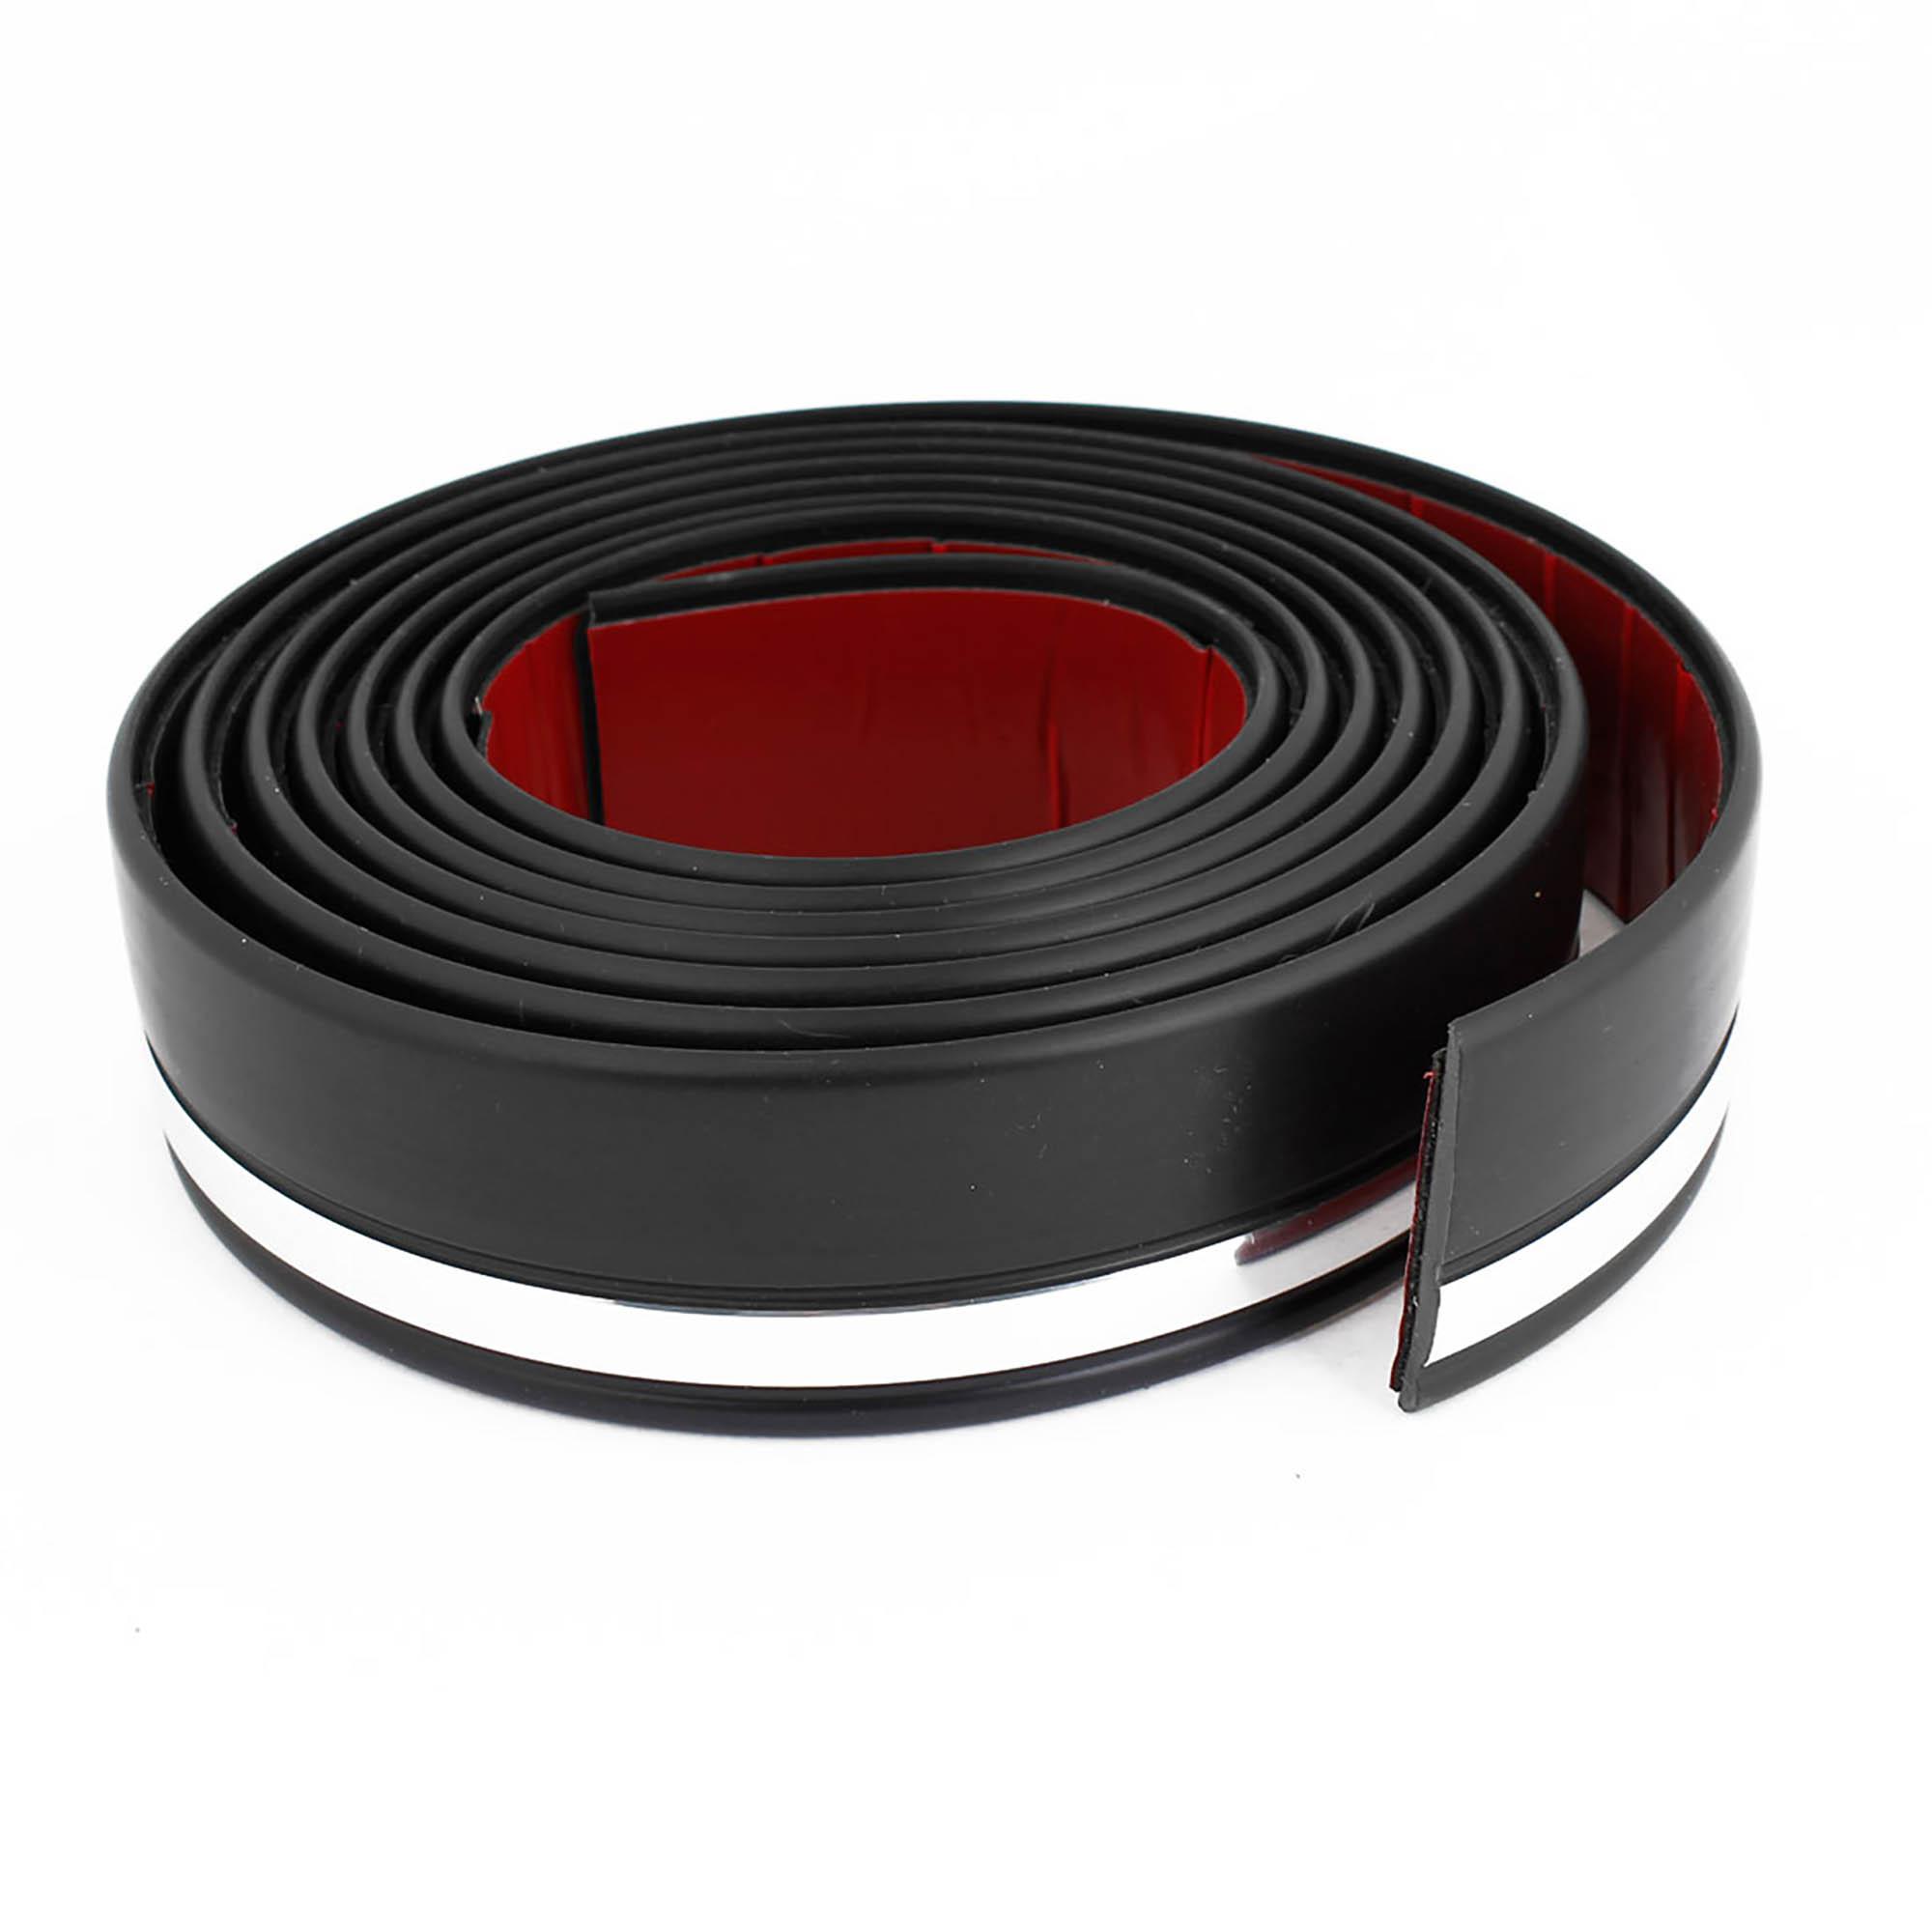 Auto Silver Tone Black Door Edge Guard Trim Protector Strip 9.8Ft 45mm Width